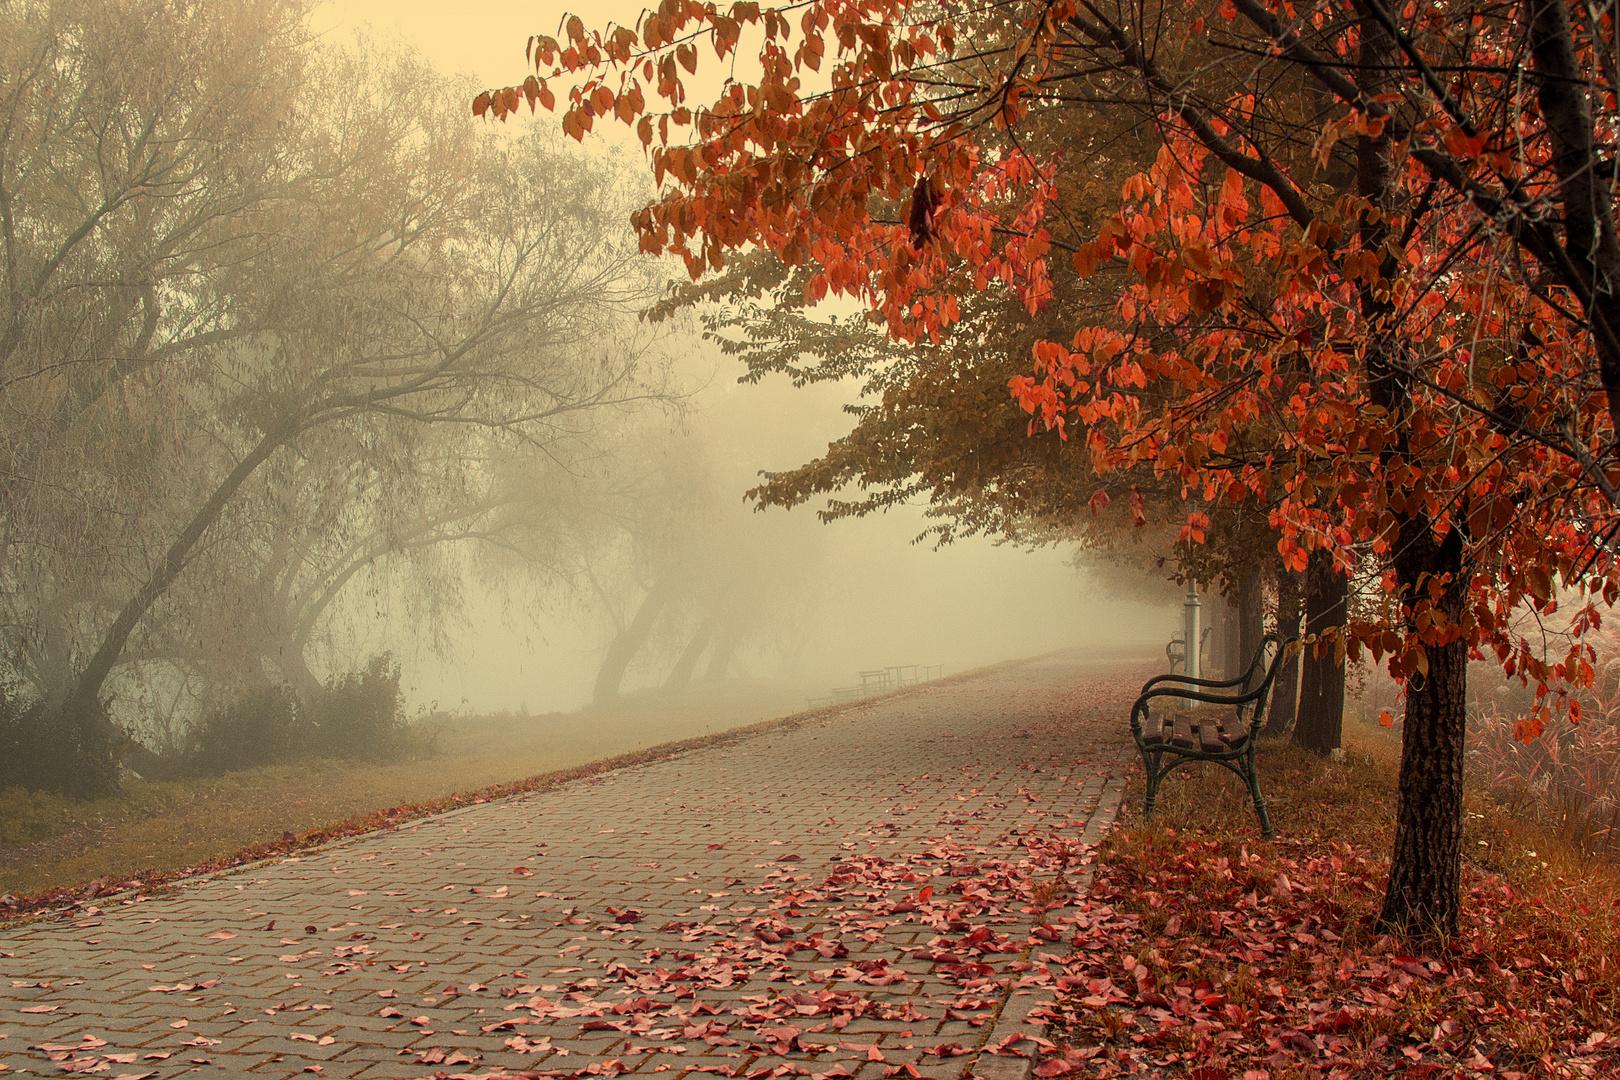 One misty autumn morning